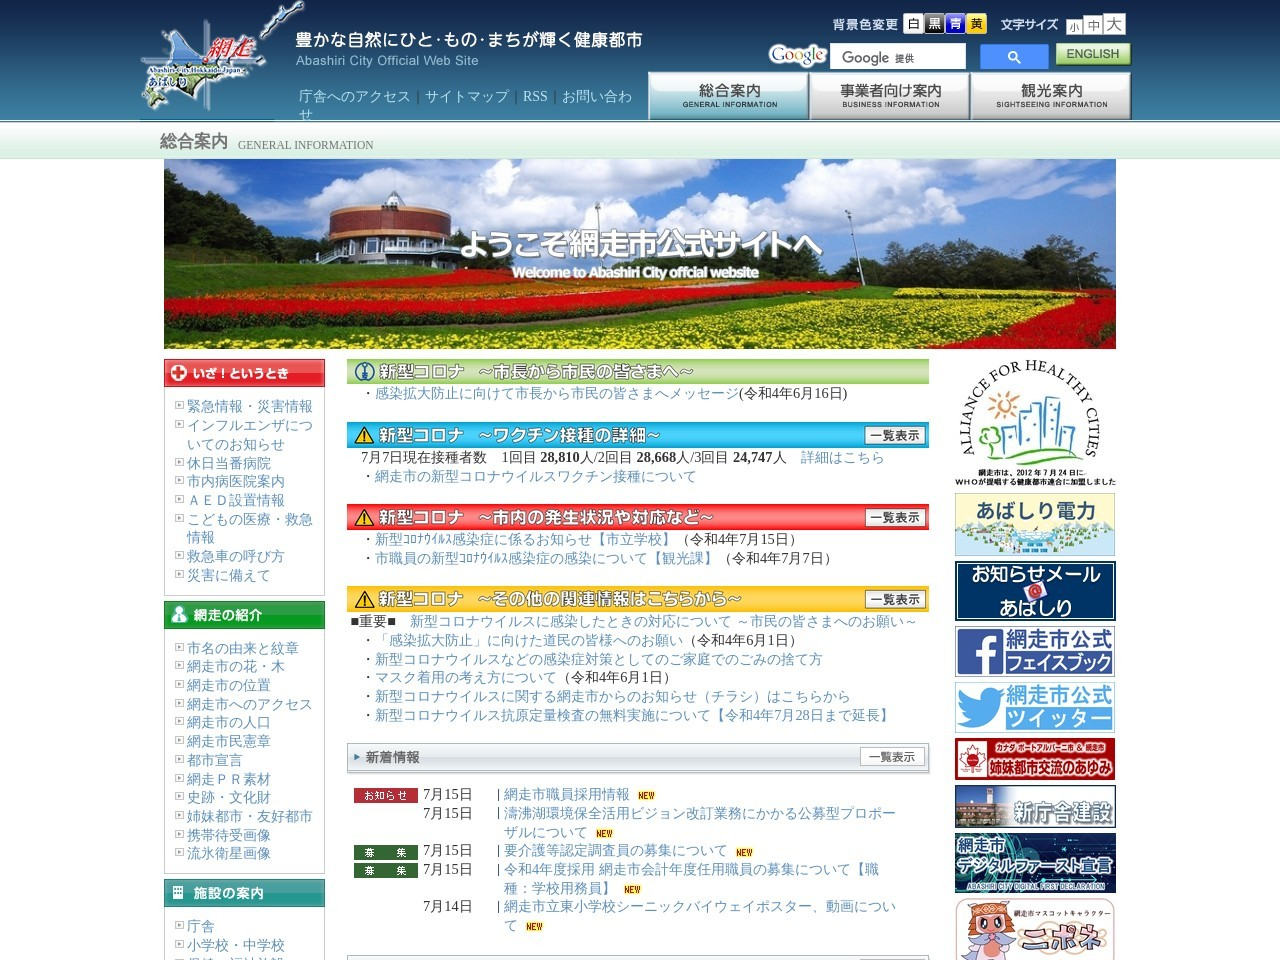 http://www.city.abashiri.hokkaido.jp/310doro/santyoukahankouentoiresiyoukinnsi.html